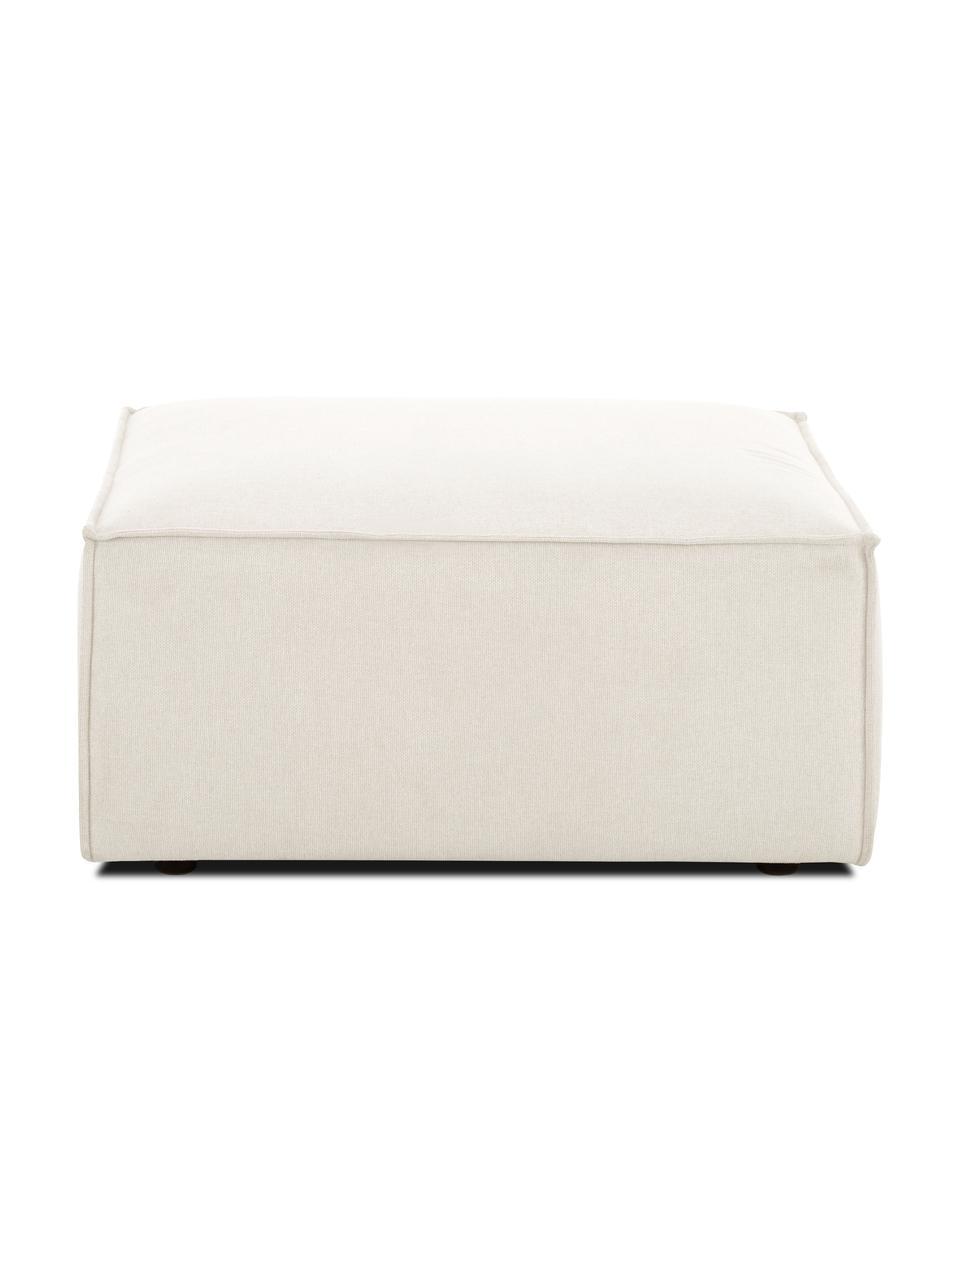 Sofa-Hocker Lennon in Beige, Bezug: Polyester Der hochwertige, Gestell: Massives Kiefernholz, Spe, Füße: Kunststoff, Webstoff Beige, 88 x 43 cm